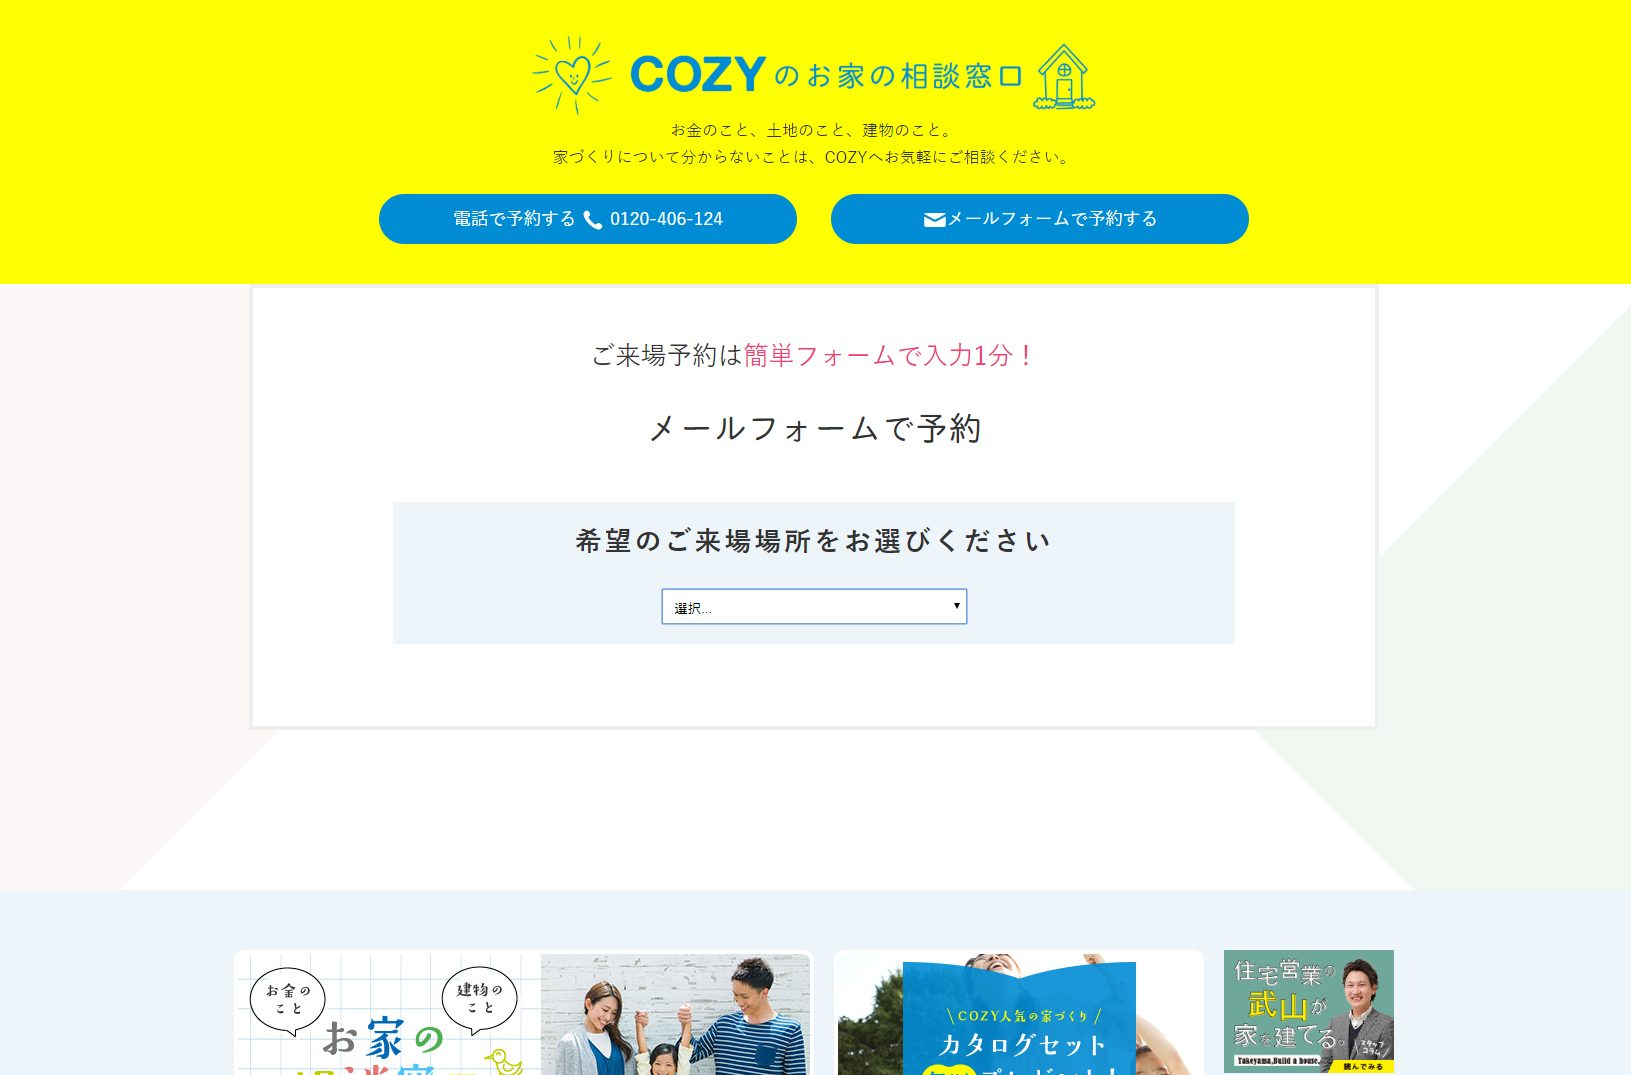 COZY見学予約サイト-パソコン画面2